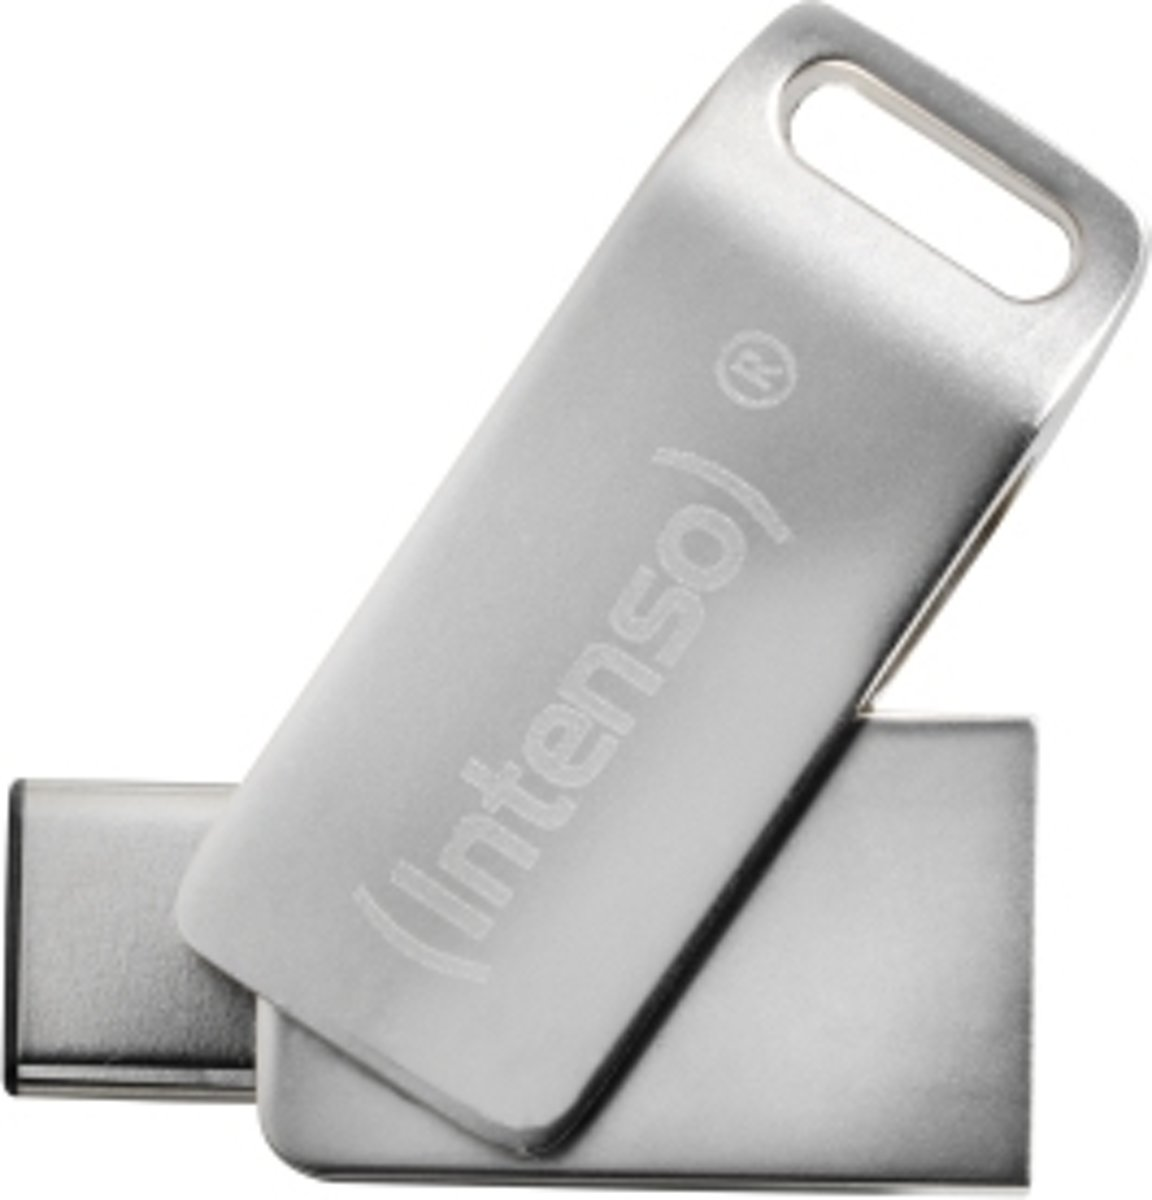 Intenso cMobile Line USB-stick smartphone/tablet Zilver 64 GB USB-C USB 3.1, USB 3.0